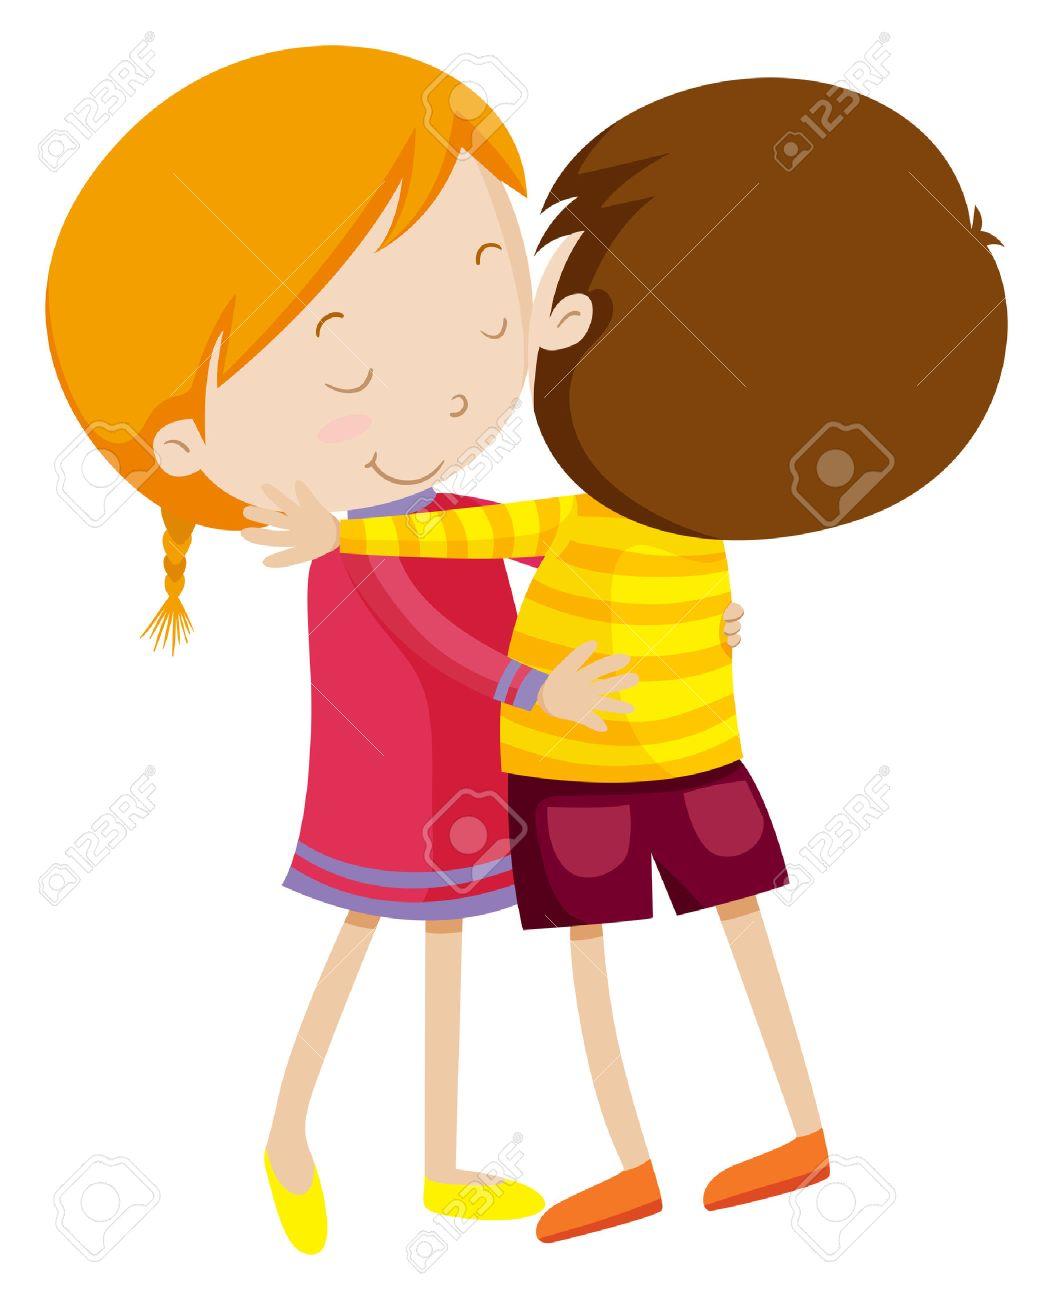 Boy and girl hugging illustration.